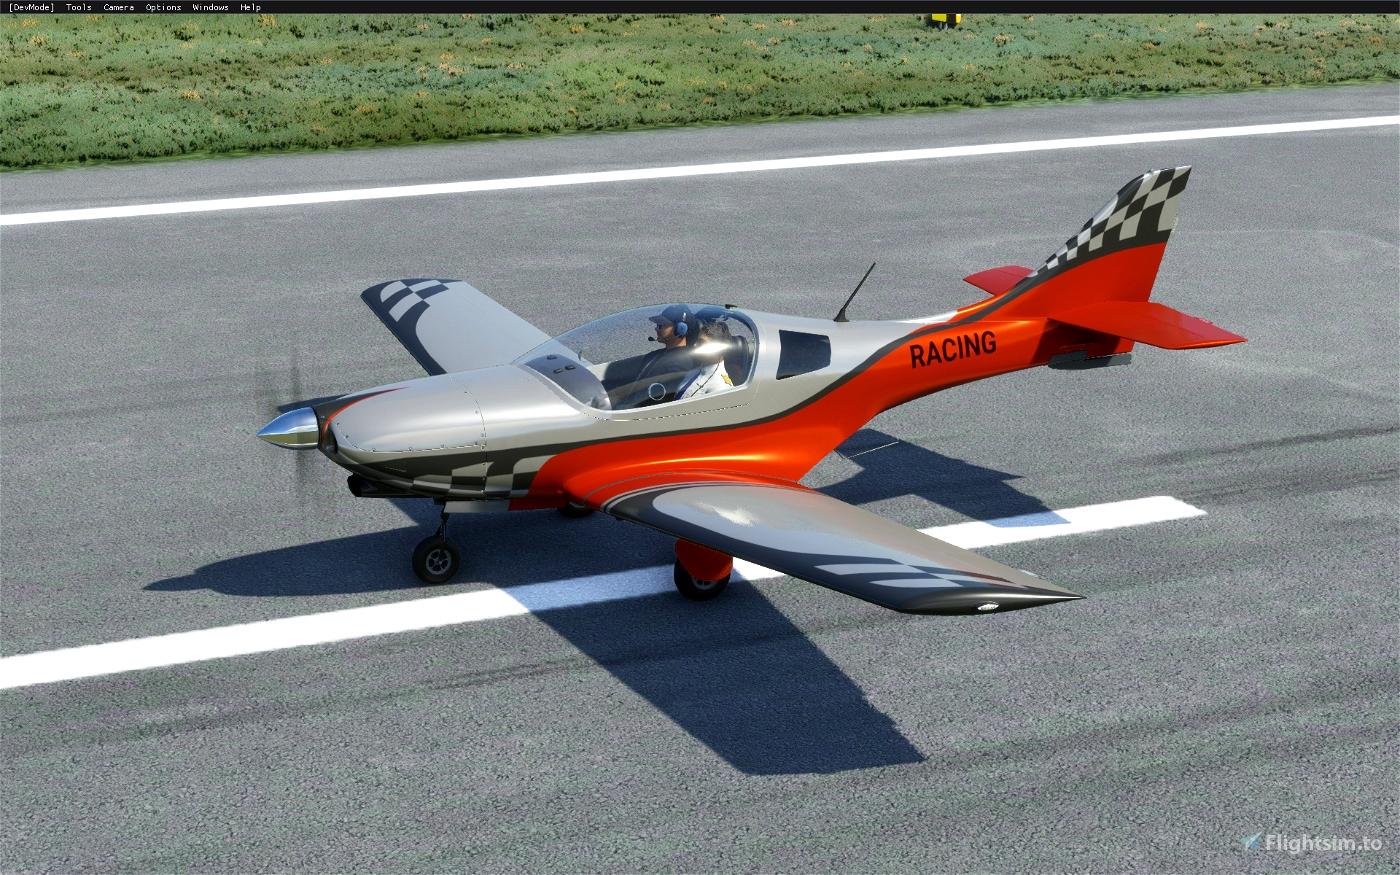 JMB VL-3 Racing Livery (5 colors)